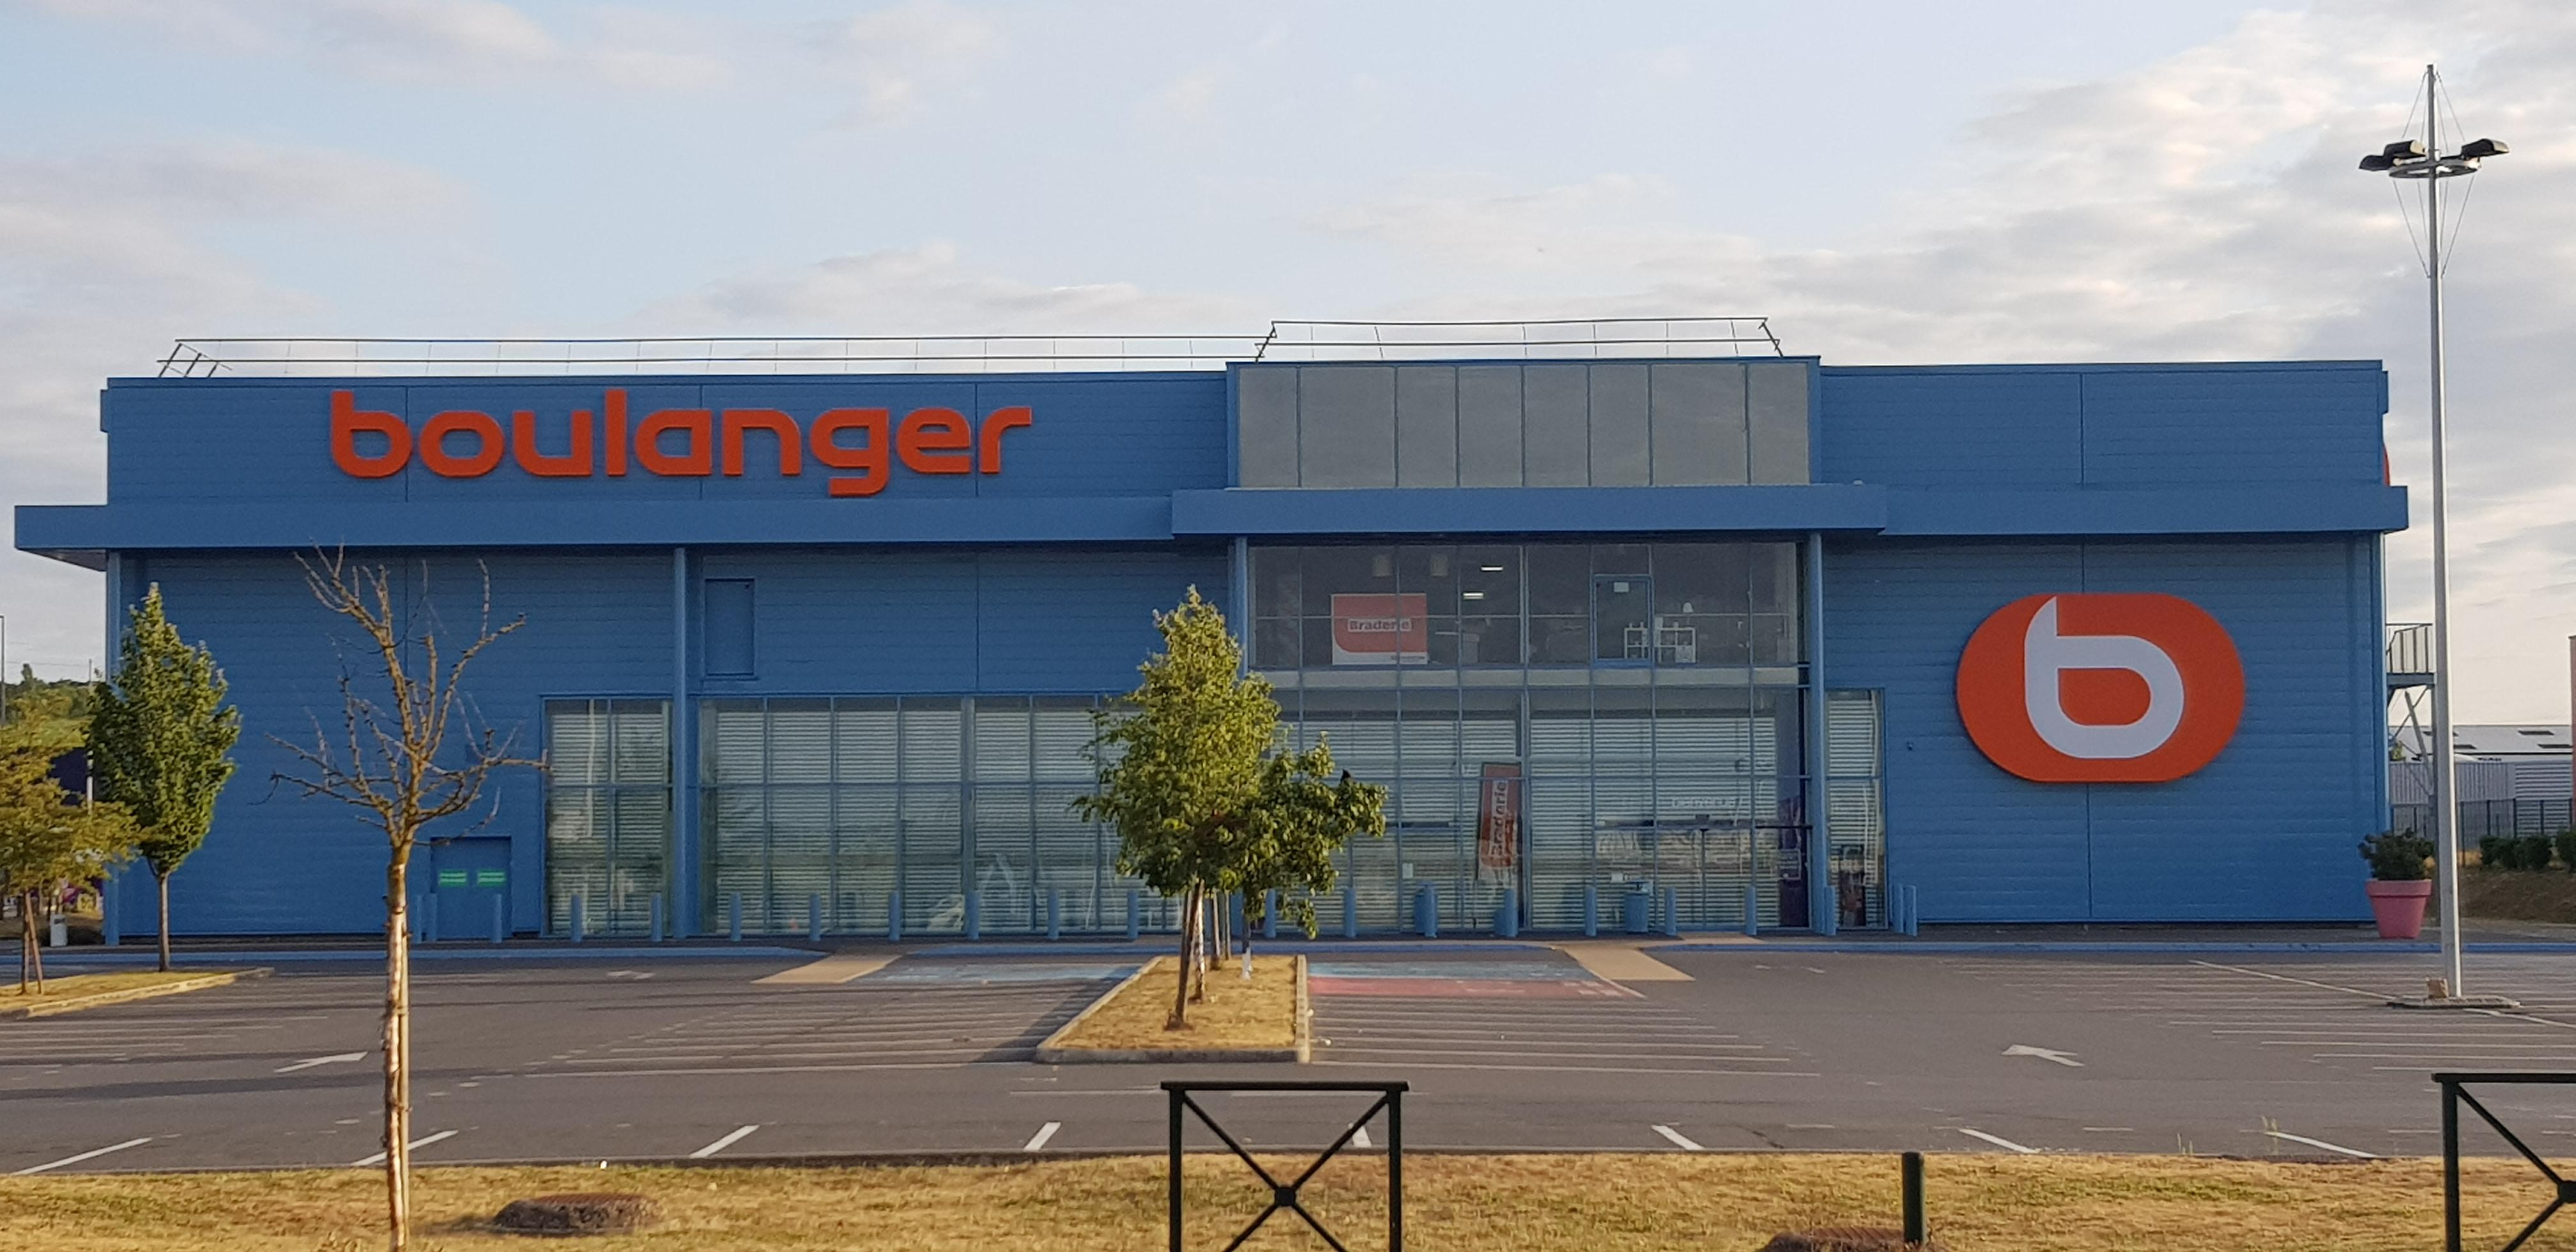 Boulanger Reims - Cormontreuil